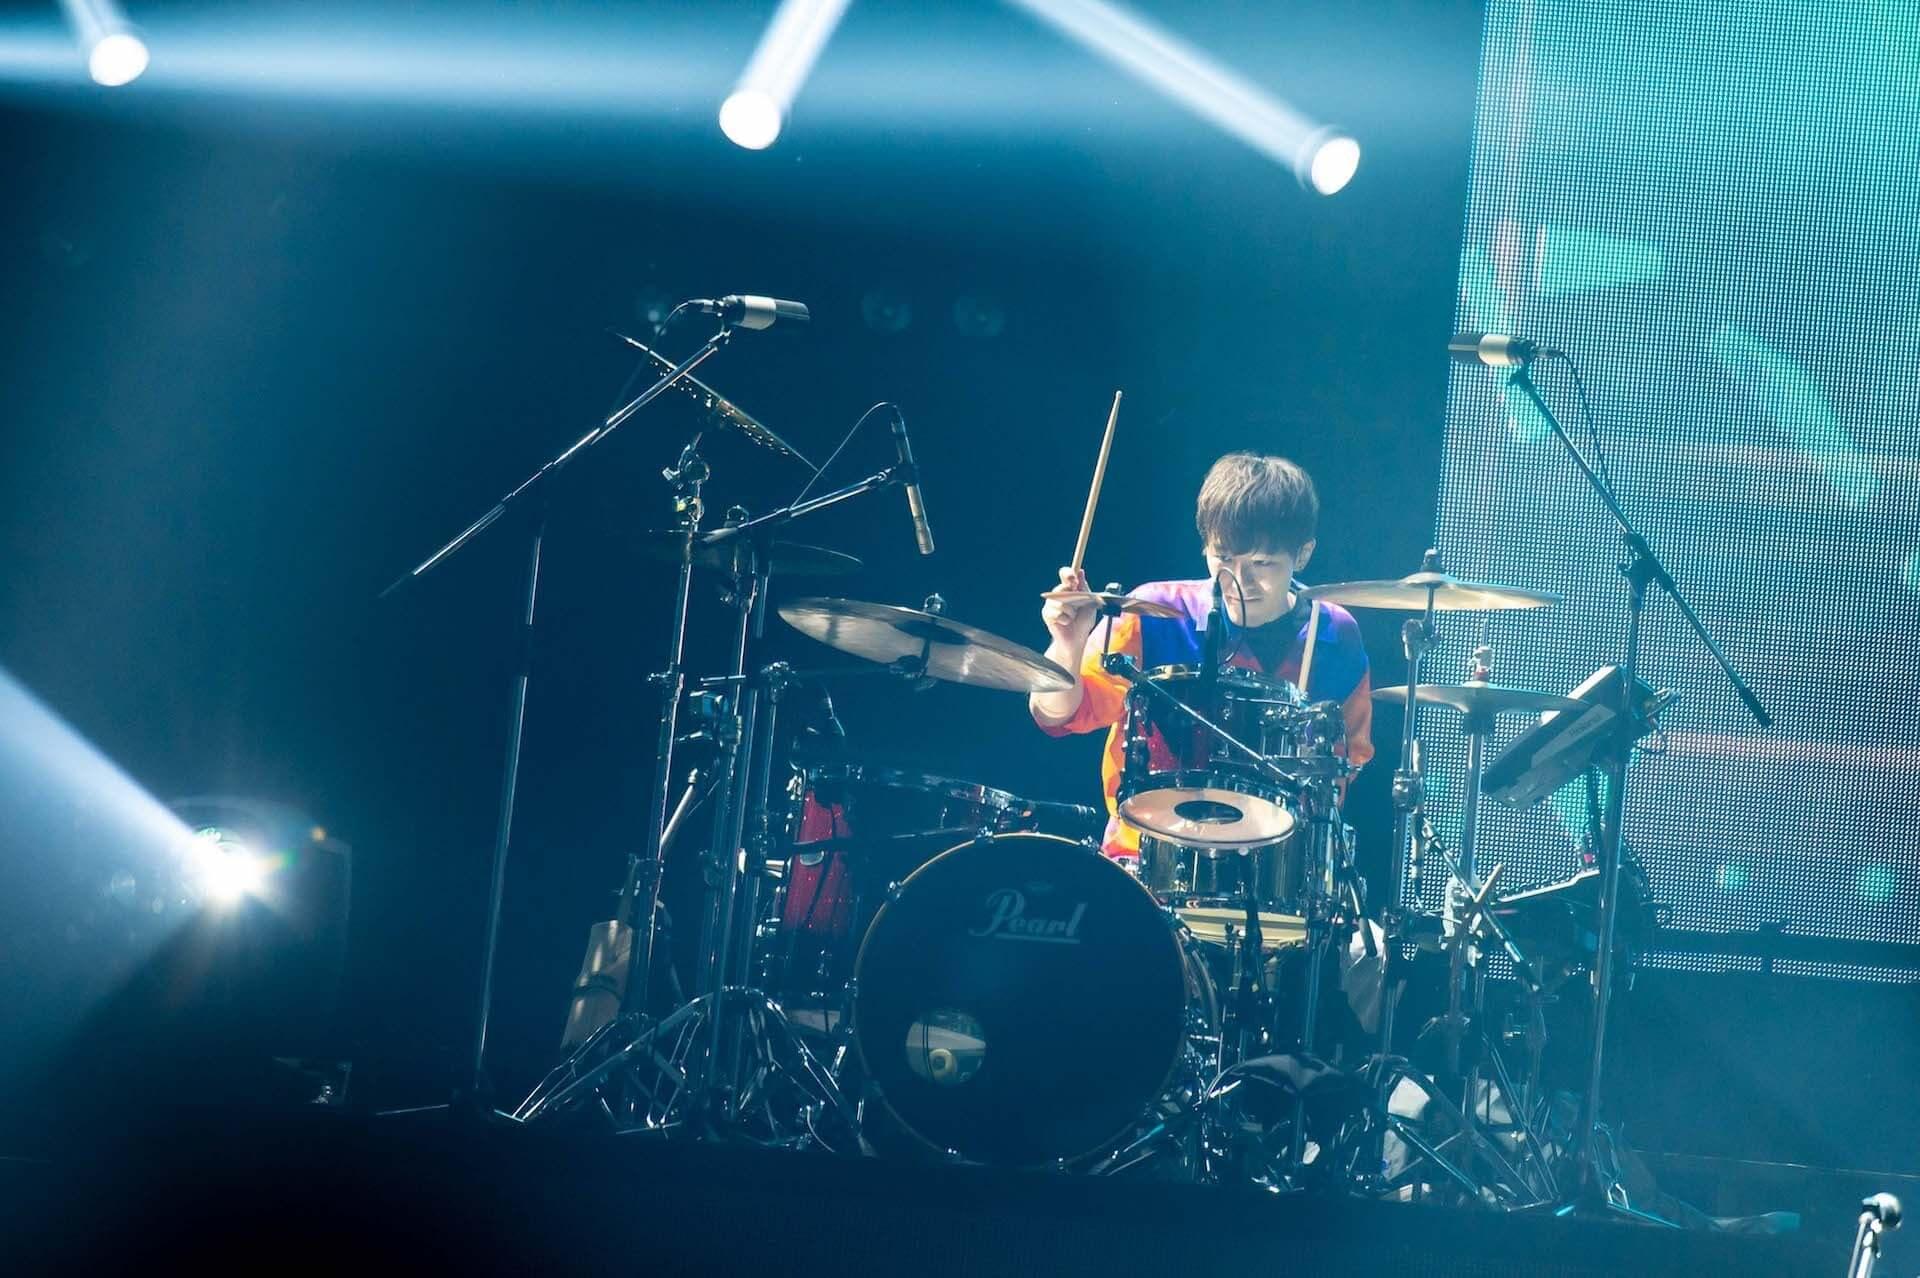 RADWIMPS横浜アリーナ公演のライブ写真が公開!<ANTI ANTI GENERATION TOUR 2019>レポート music190830_radwimps_live_19-1920x1278